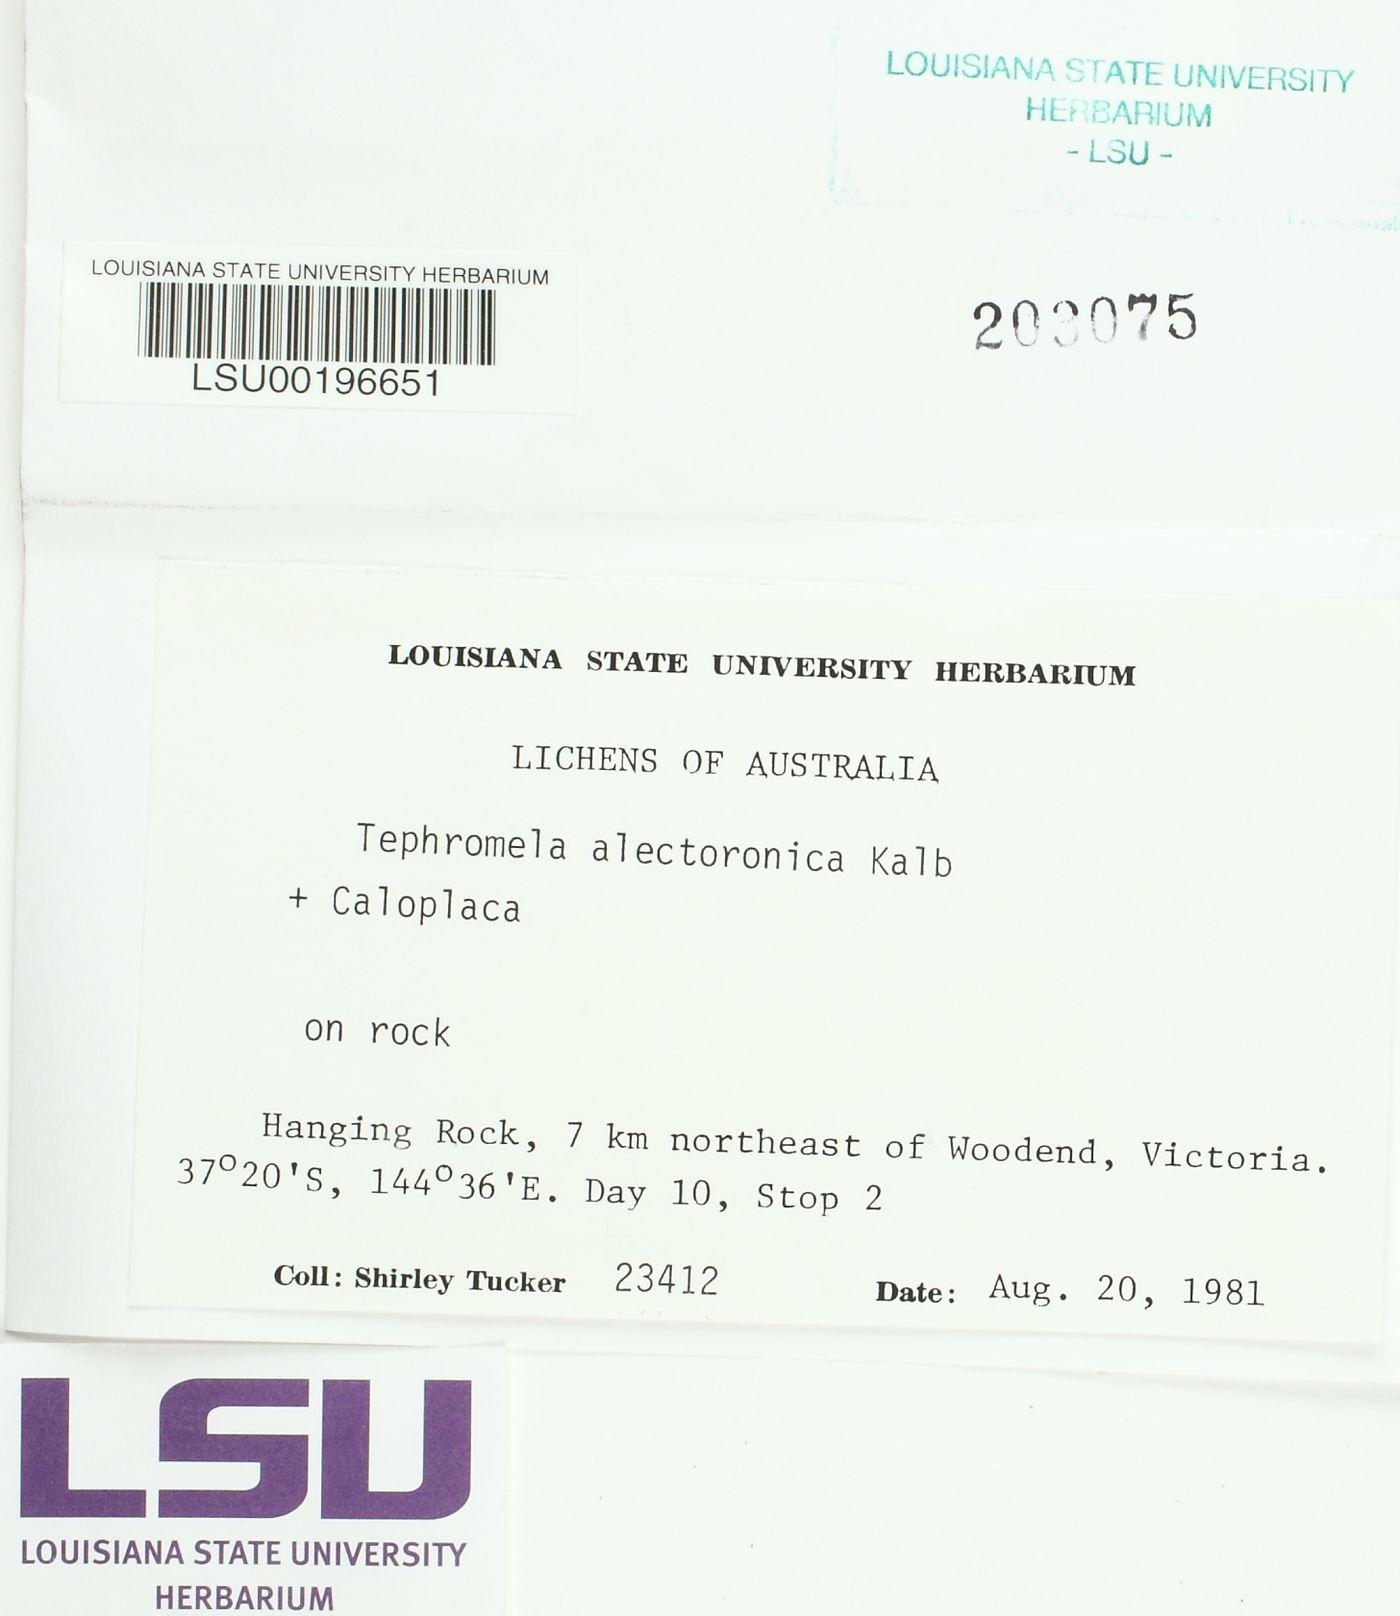 Tephromela alectoronica image